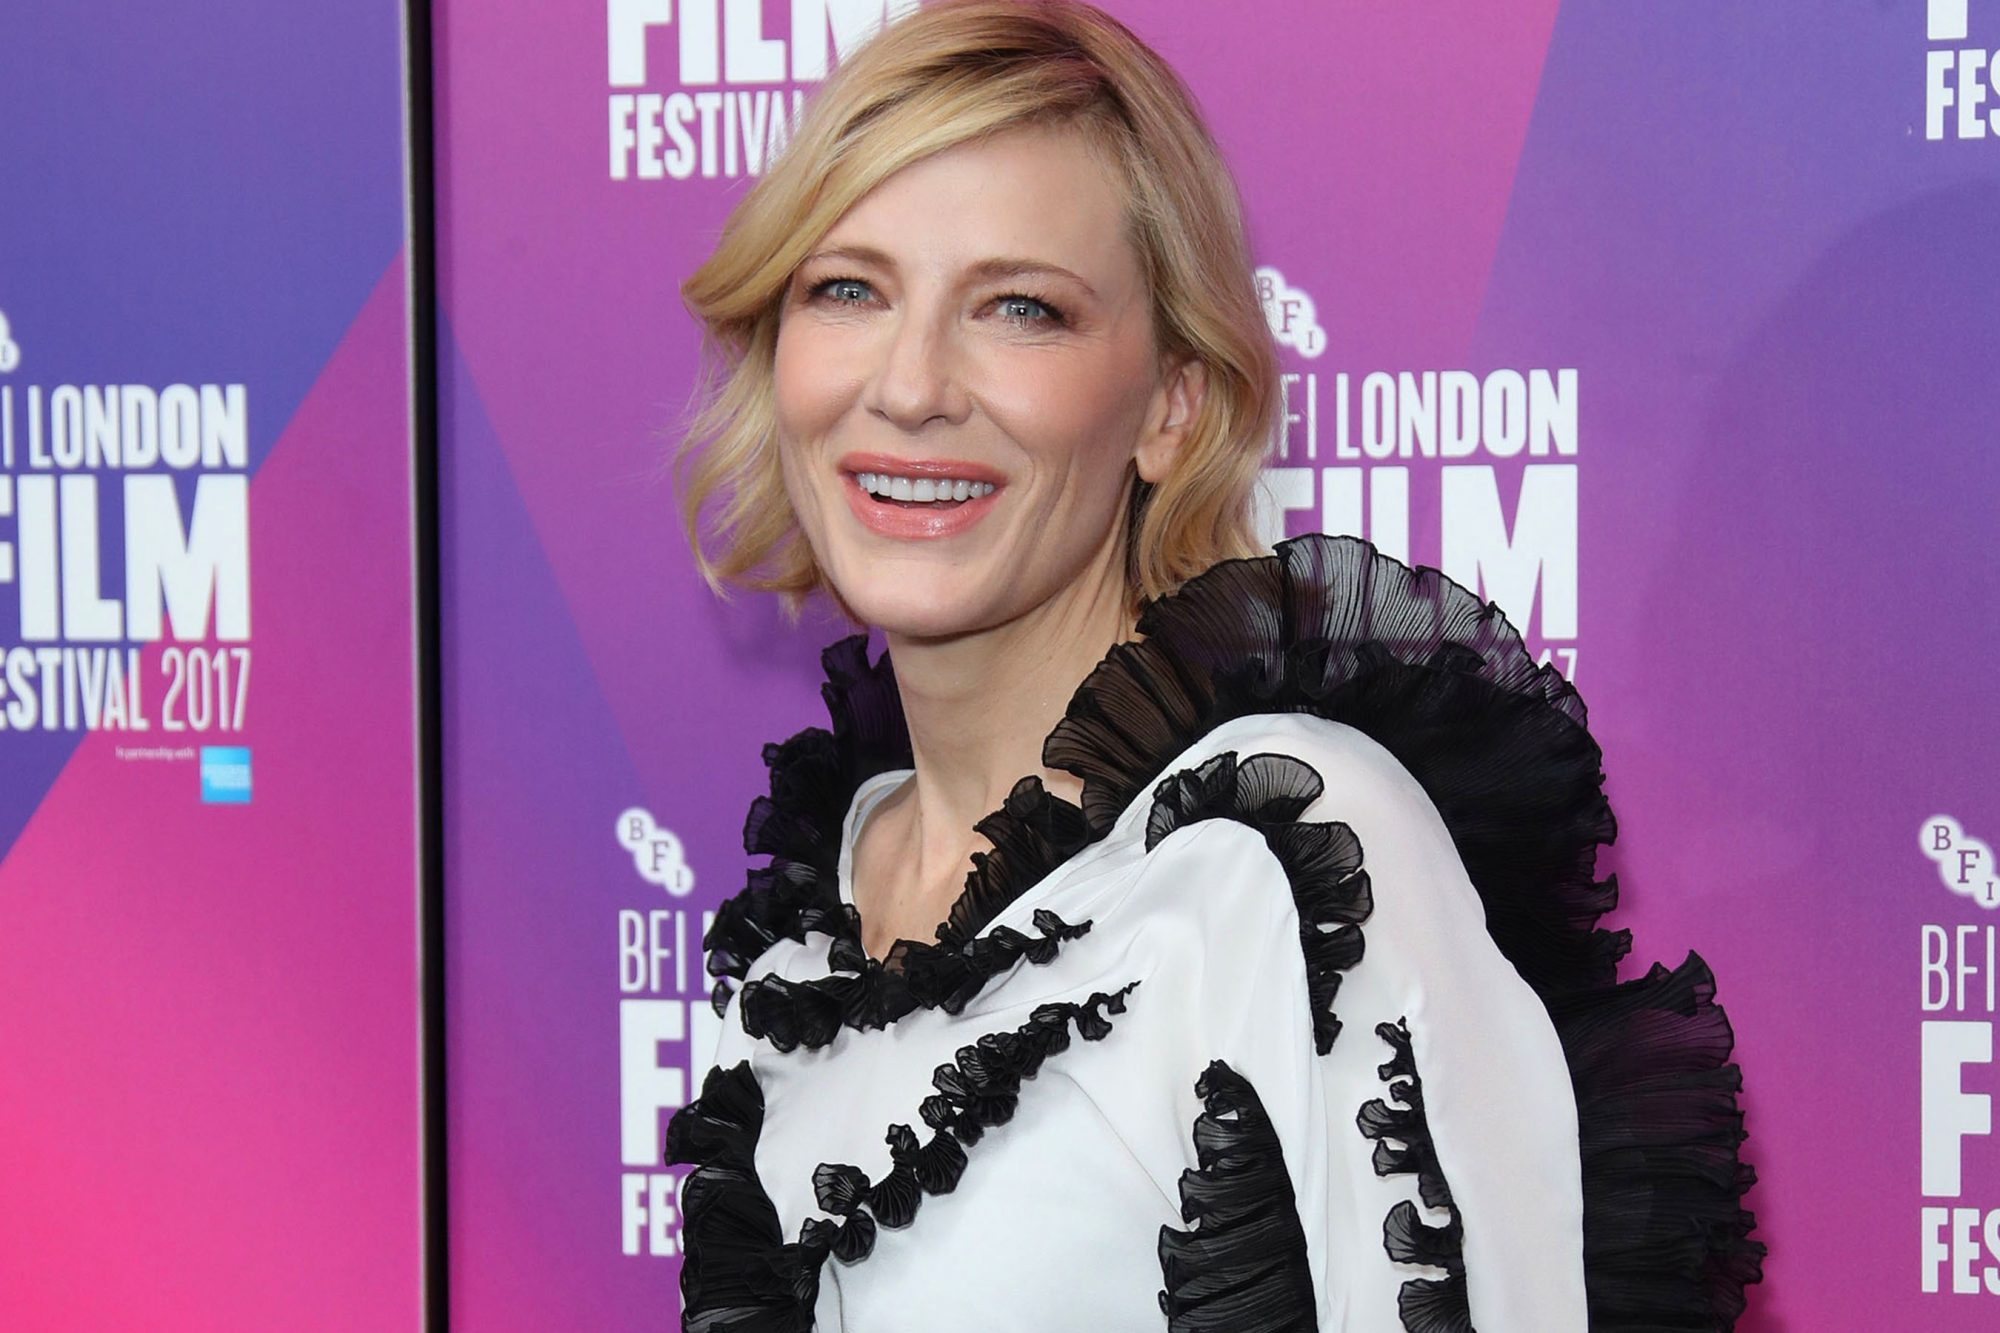 LFF Connects: Julian Rosefeldt & Cate Blanchett - 61st BFI London Film Festival